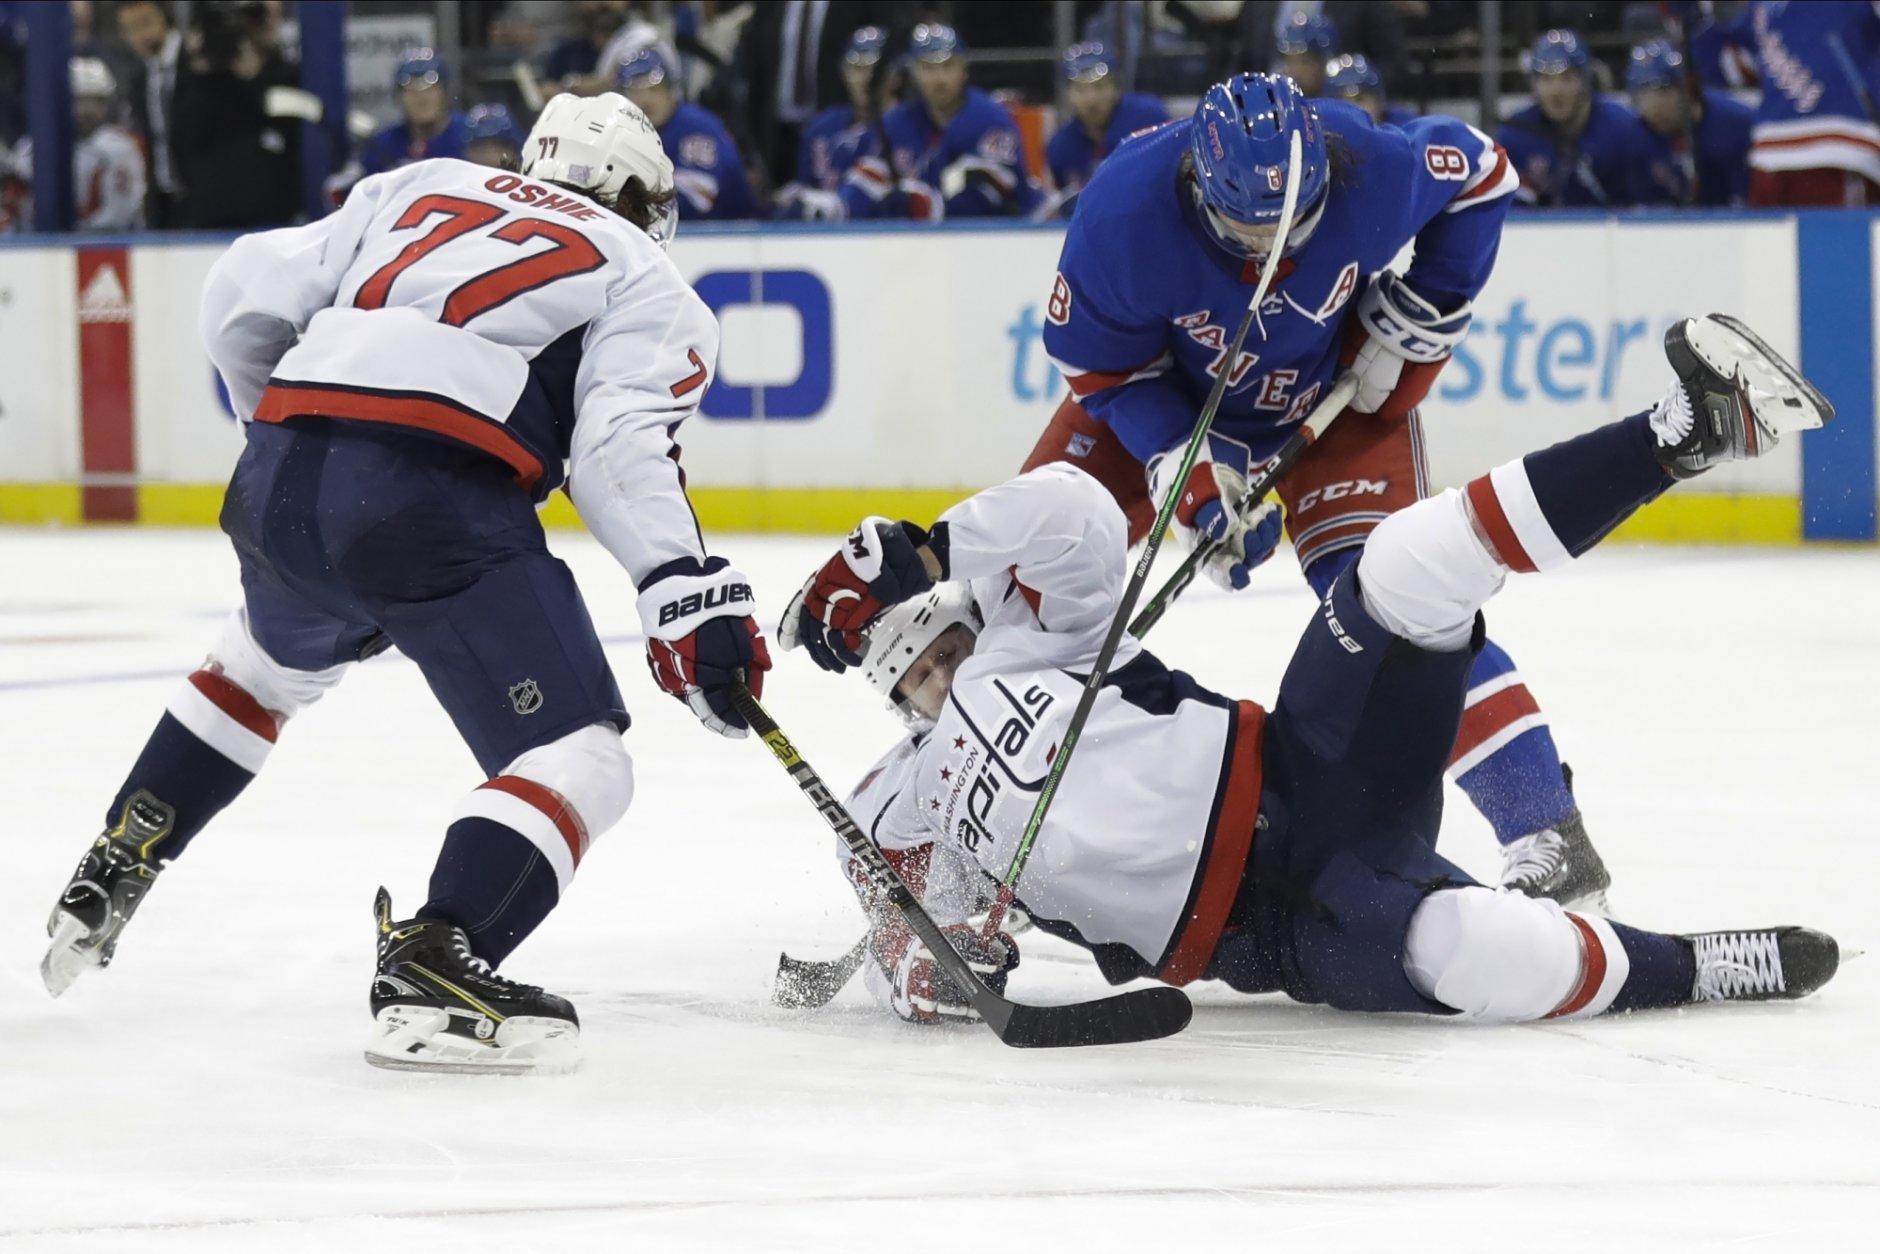 New York Rangers' Jacob Trouba (8) checks Washington Capitals' Jakub Vrana (13) as T.J. Oshie (77) watches during the second period of an NHL hockey game Wednesday, Nov. 20, 2019, in New York. (AP Photo/Frank Franklin II)